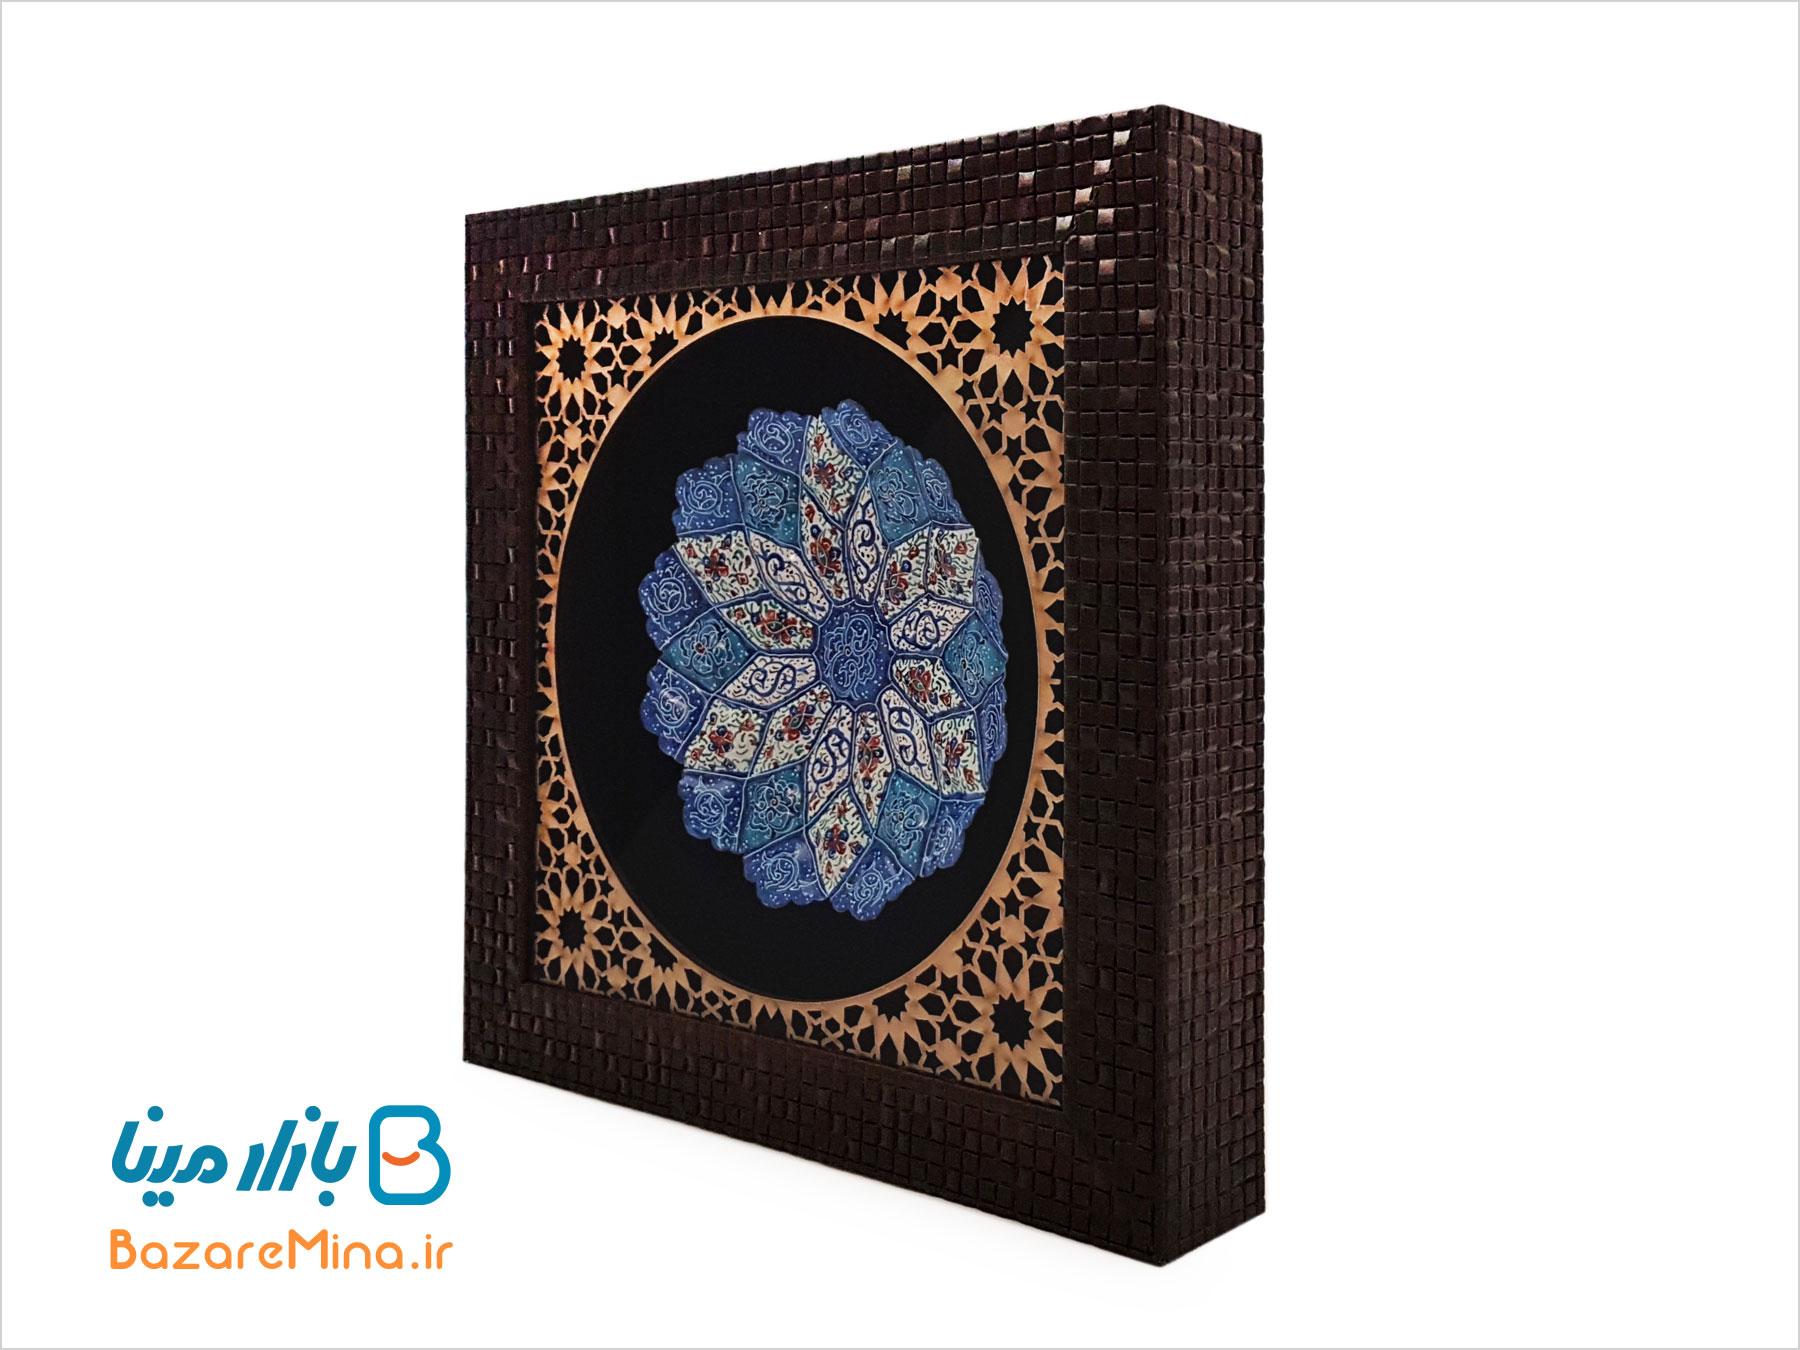 تابلو میناکاری اصفهان طرح مشبک